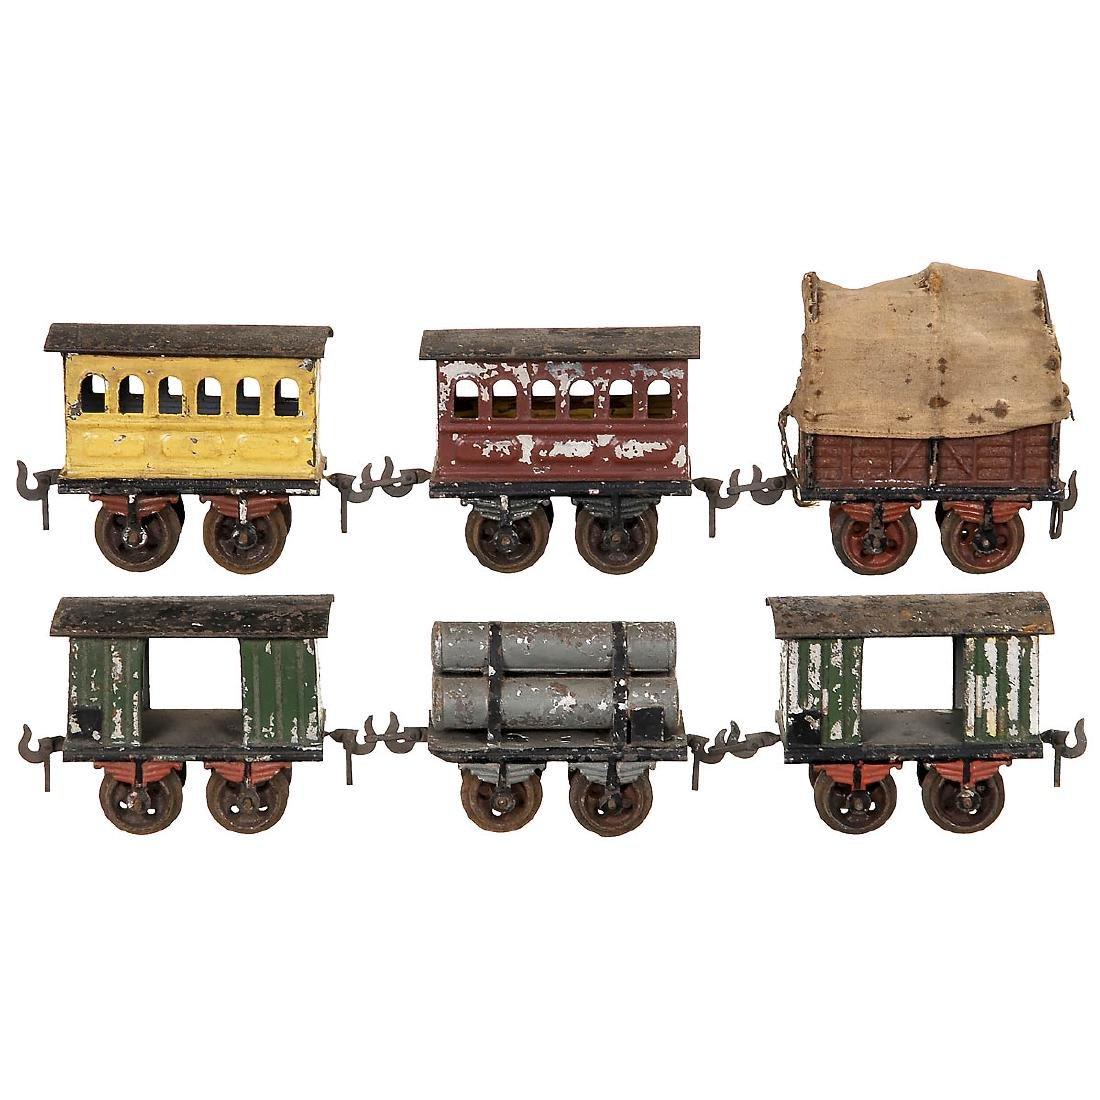 6 Early Railway Wagons by Bing Gauge 0, c. 1898